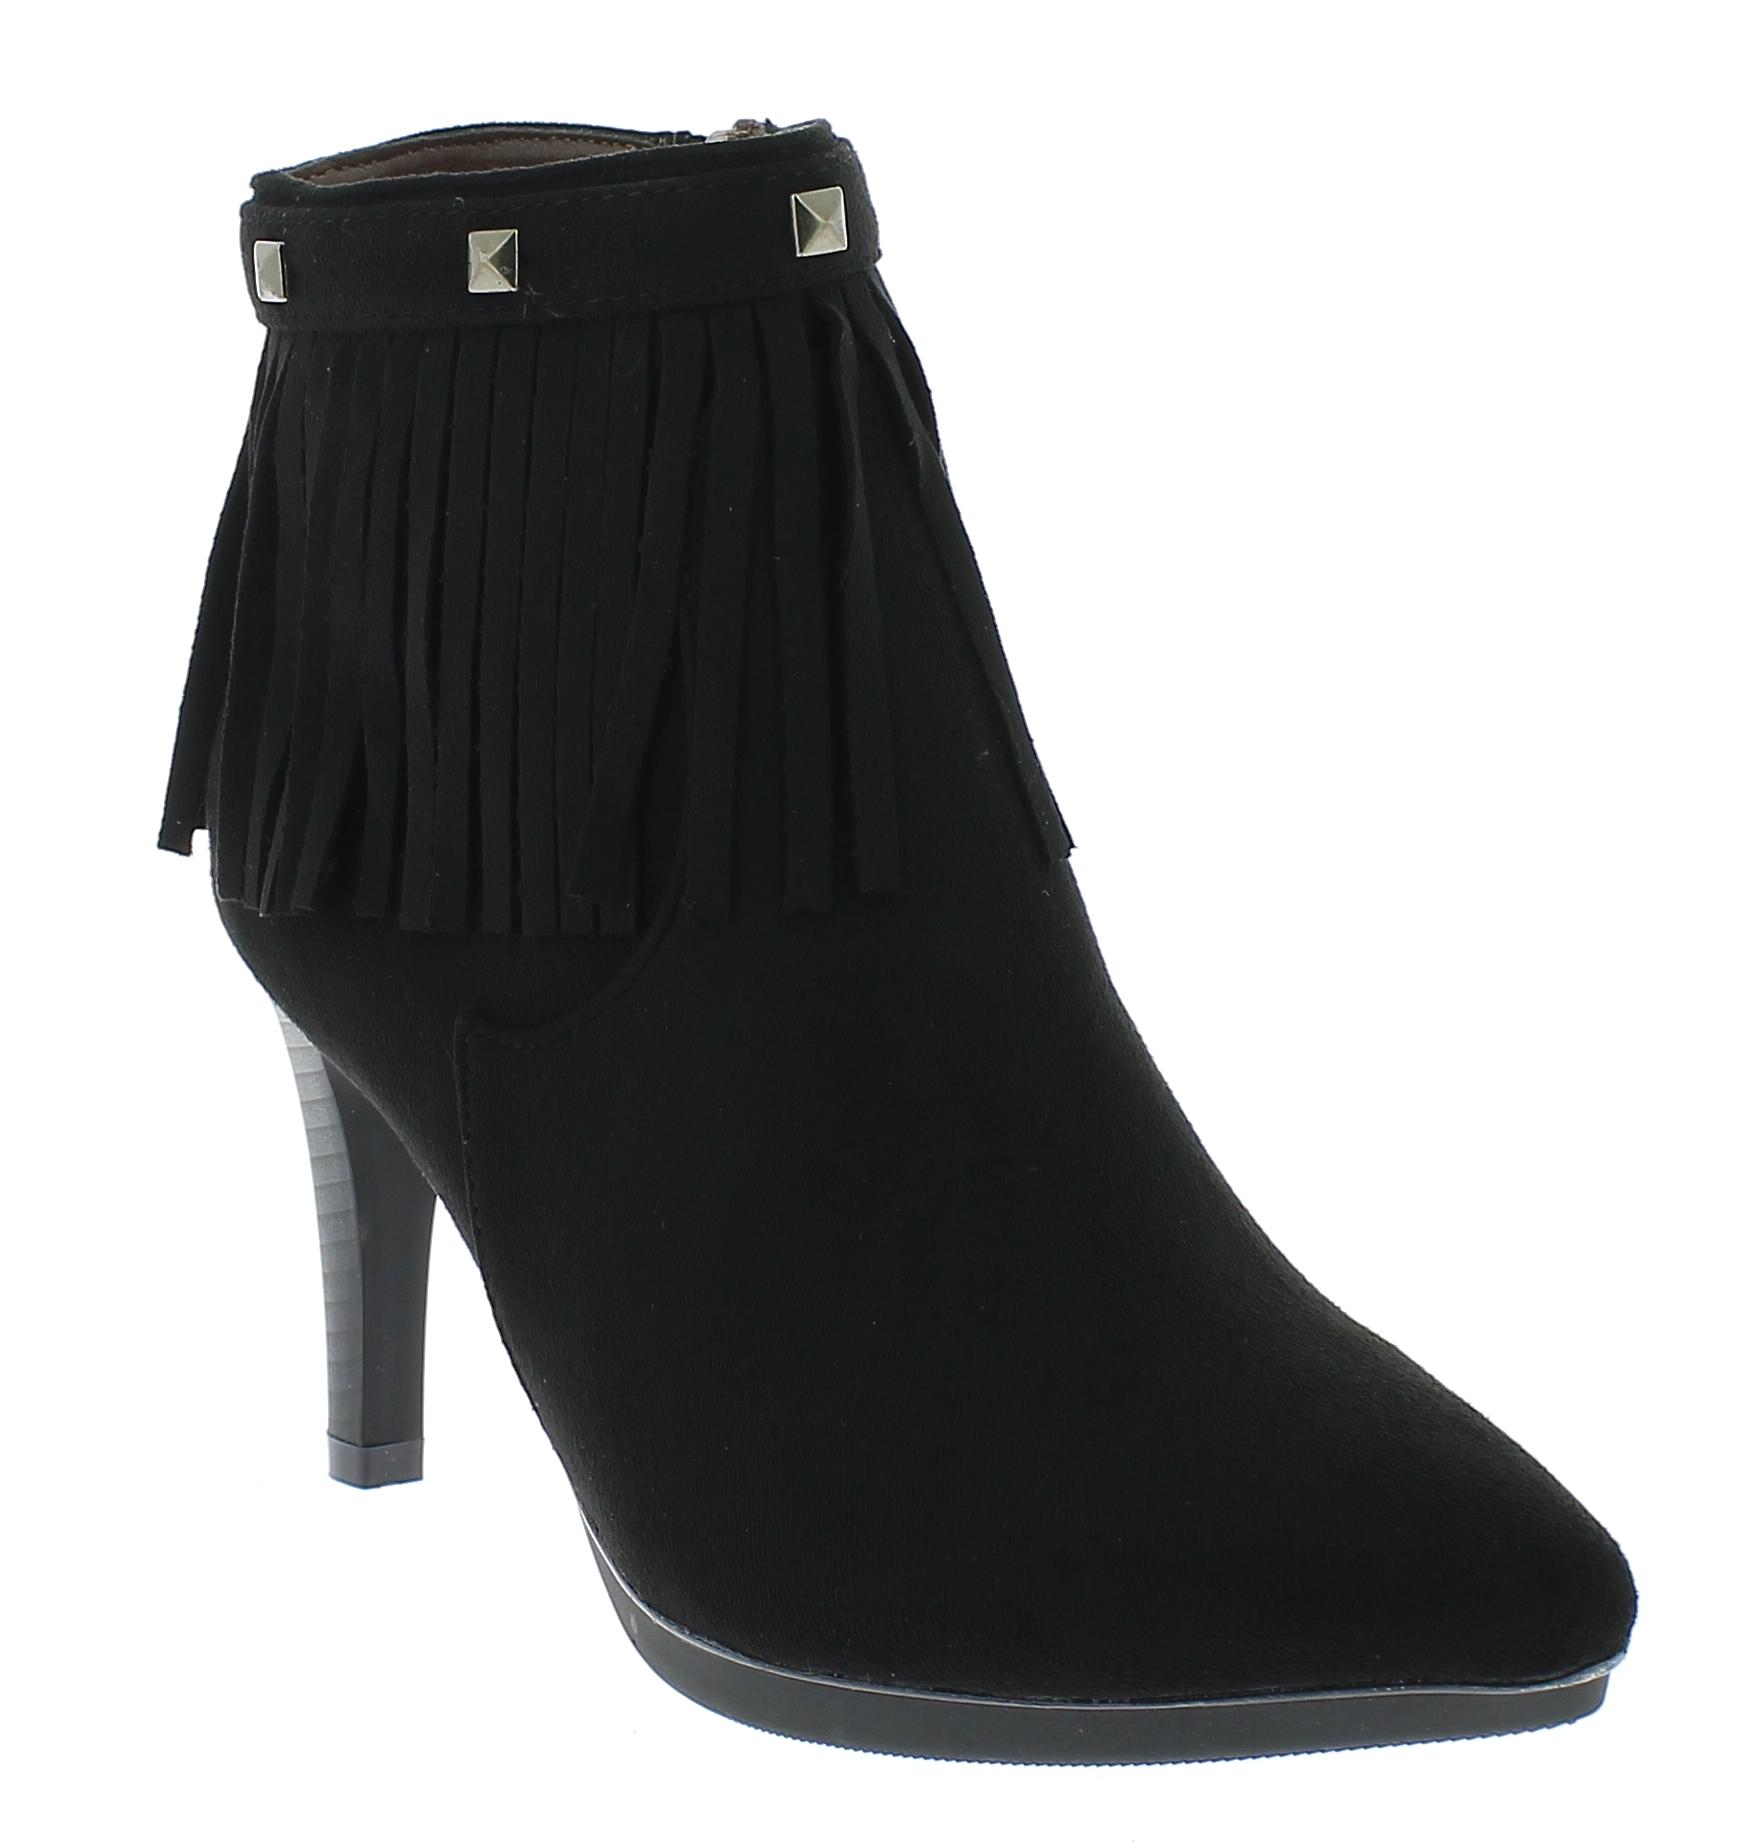 BALLERI Γυναικείο Μποτάκι BL16115 Μαύρο - IqShoes - BL1611-5 BLACK -black-39/1/1 παπούτσια  γυναικεία μποτάκια